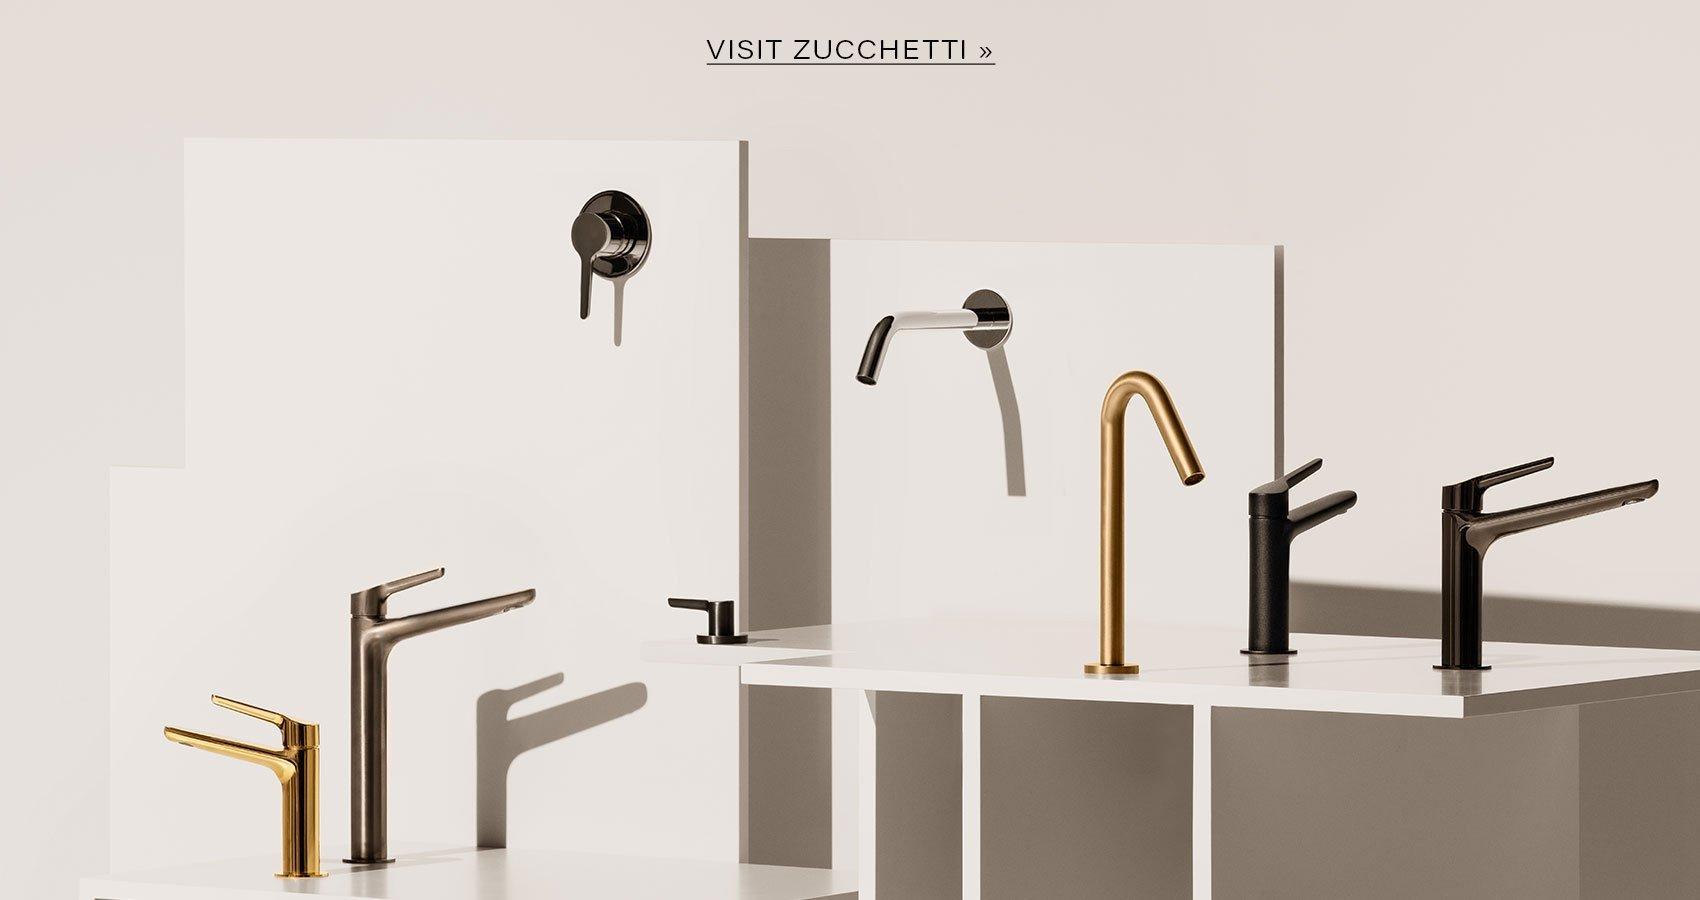 Visit Zucchetti